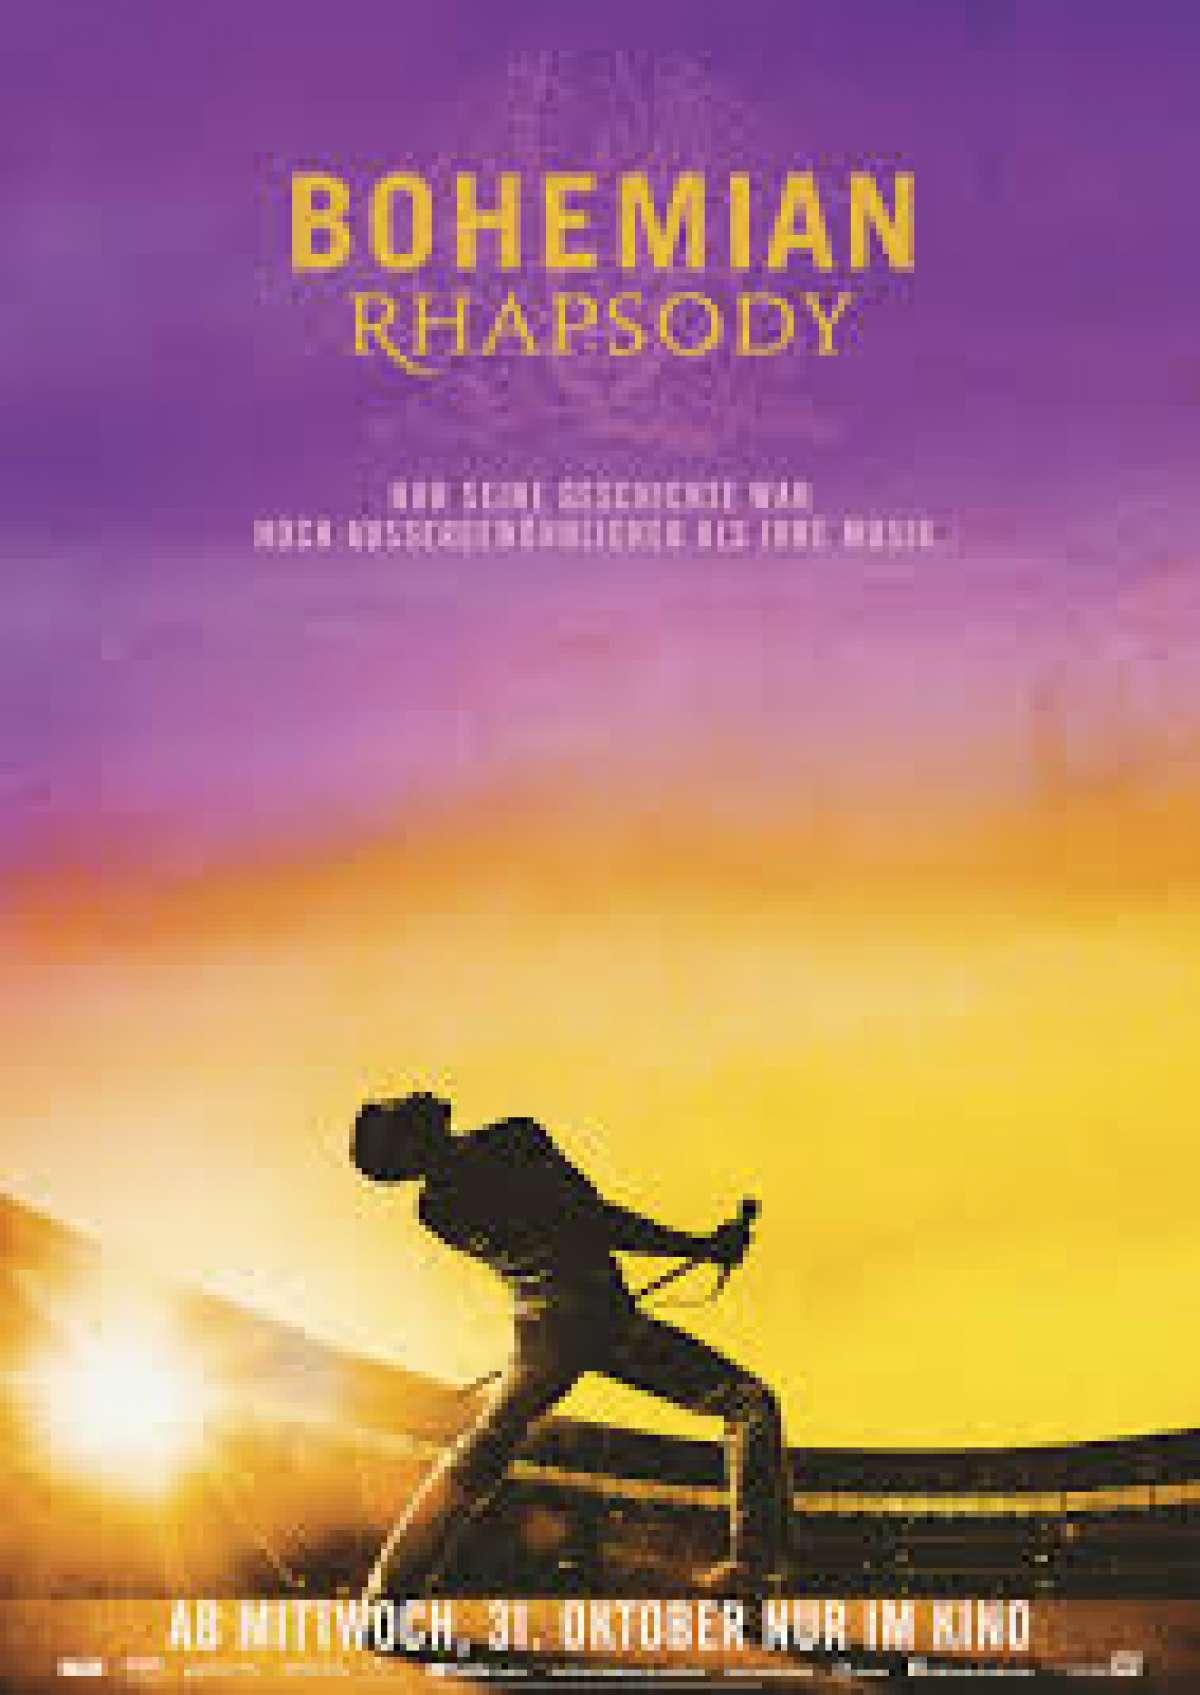 Bohemian Rhapsody -  Autokino  Parkplatz Hella Lichtkanal - Lippstadt